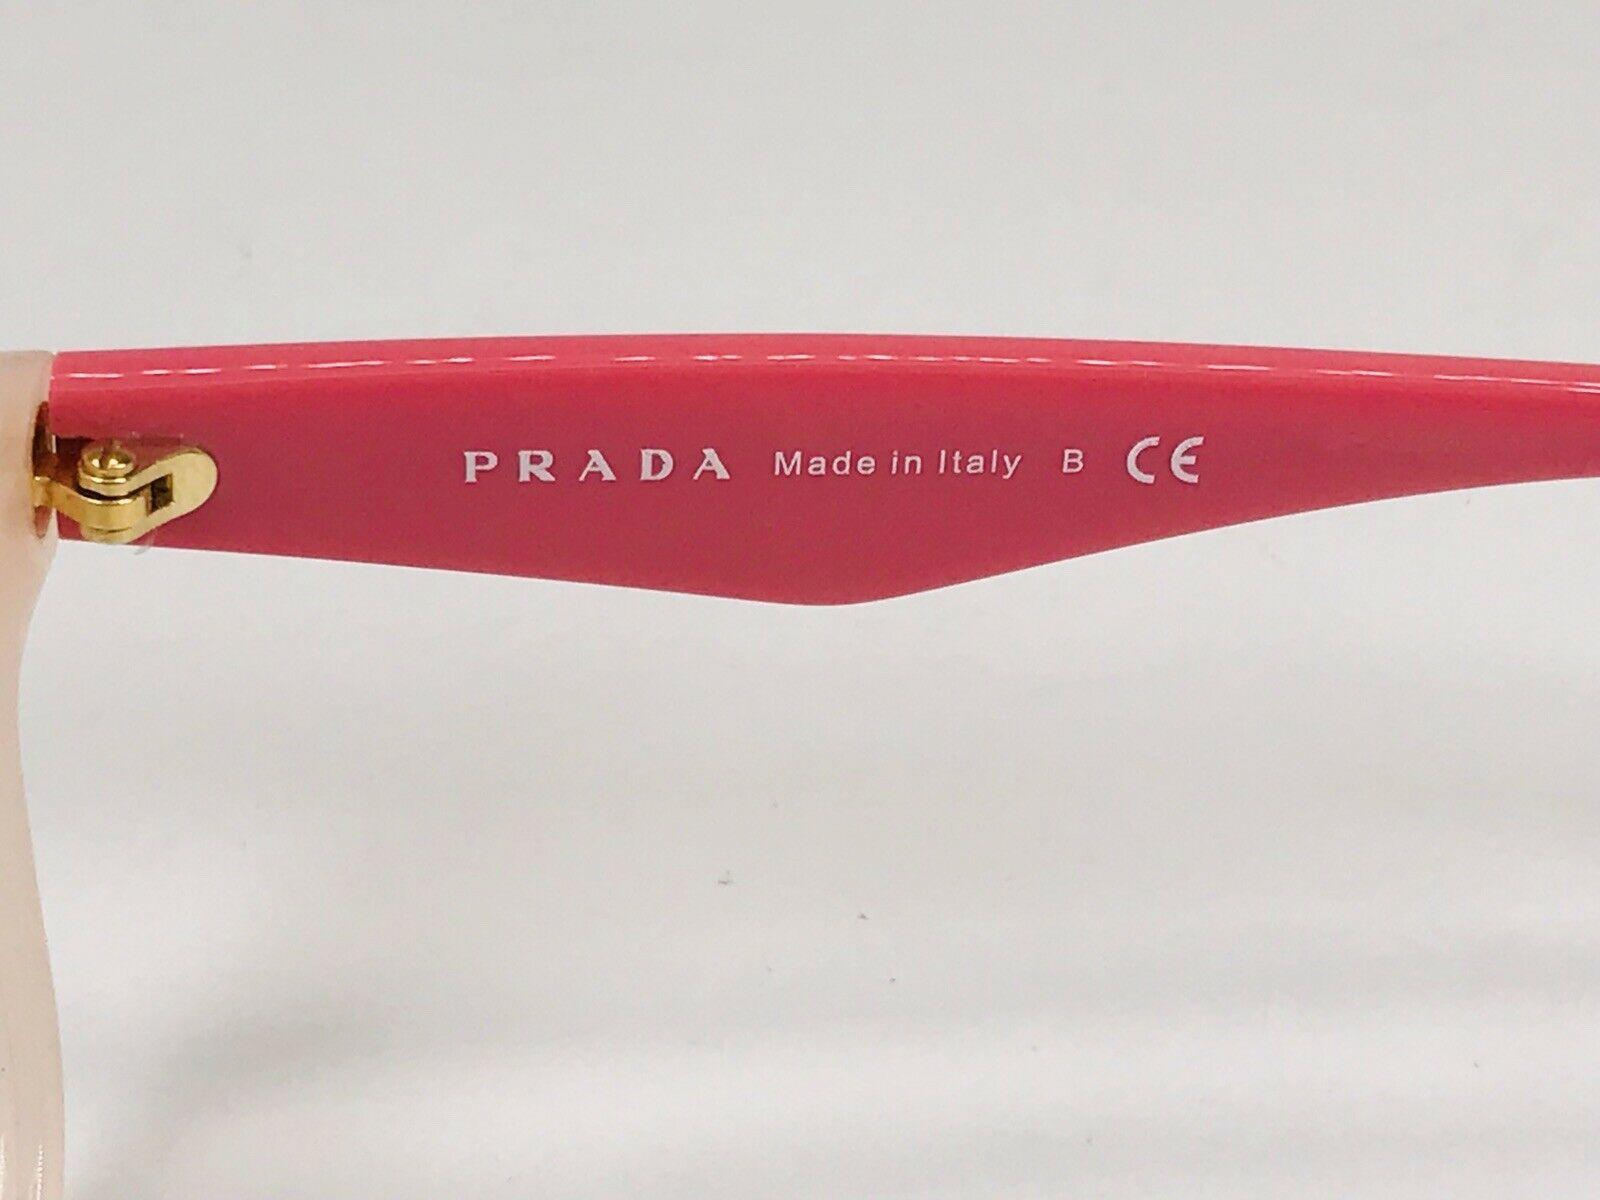 ✴ New Prada VPR 29R UEW-1O1 Two Toned Pink Eyeglasses 54mm with Prada Case